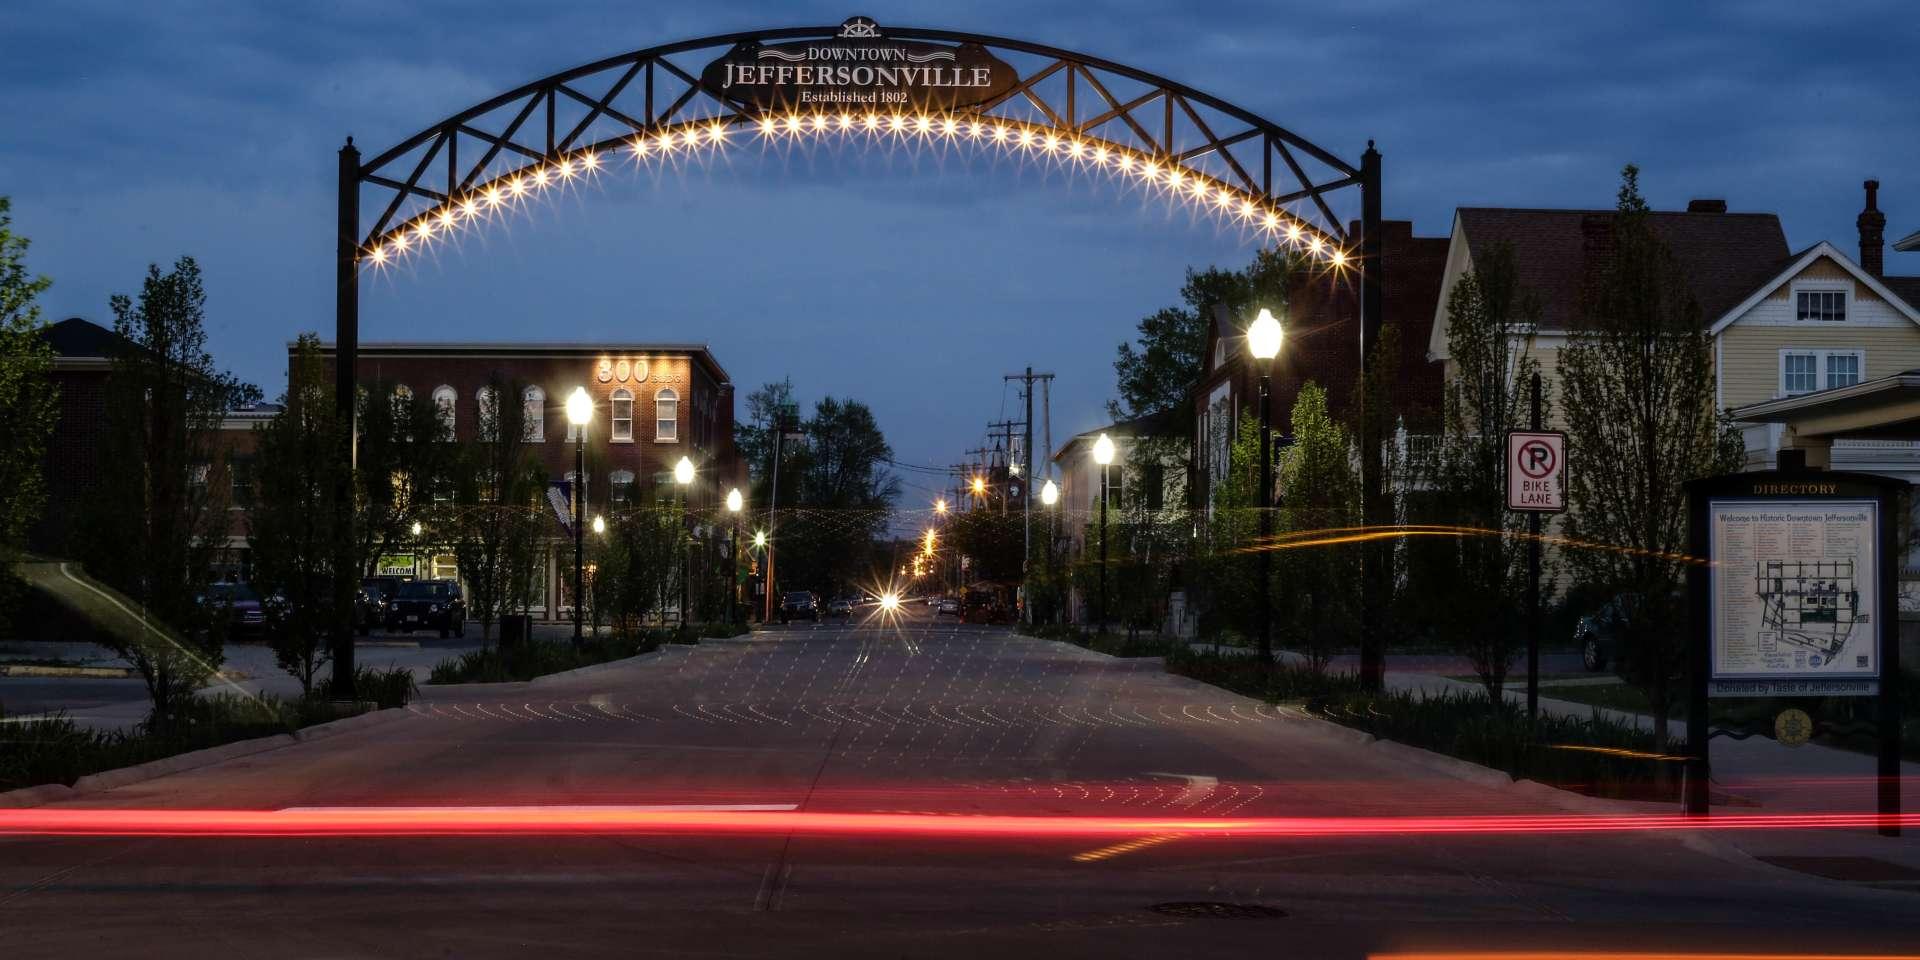 Jeffersonville Arch